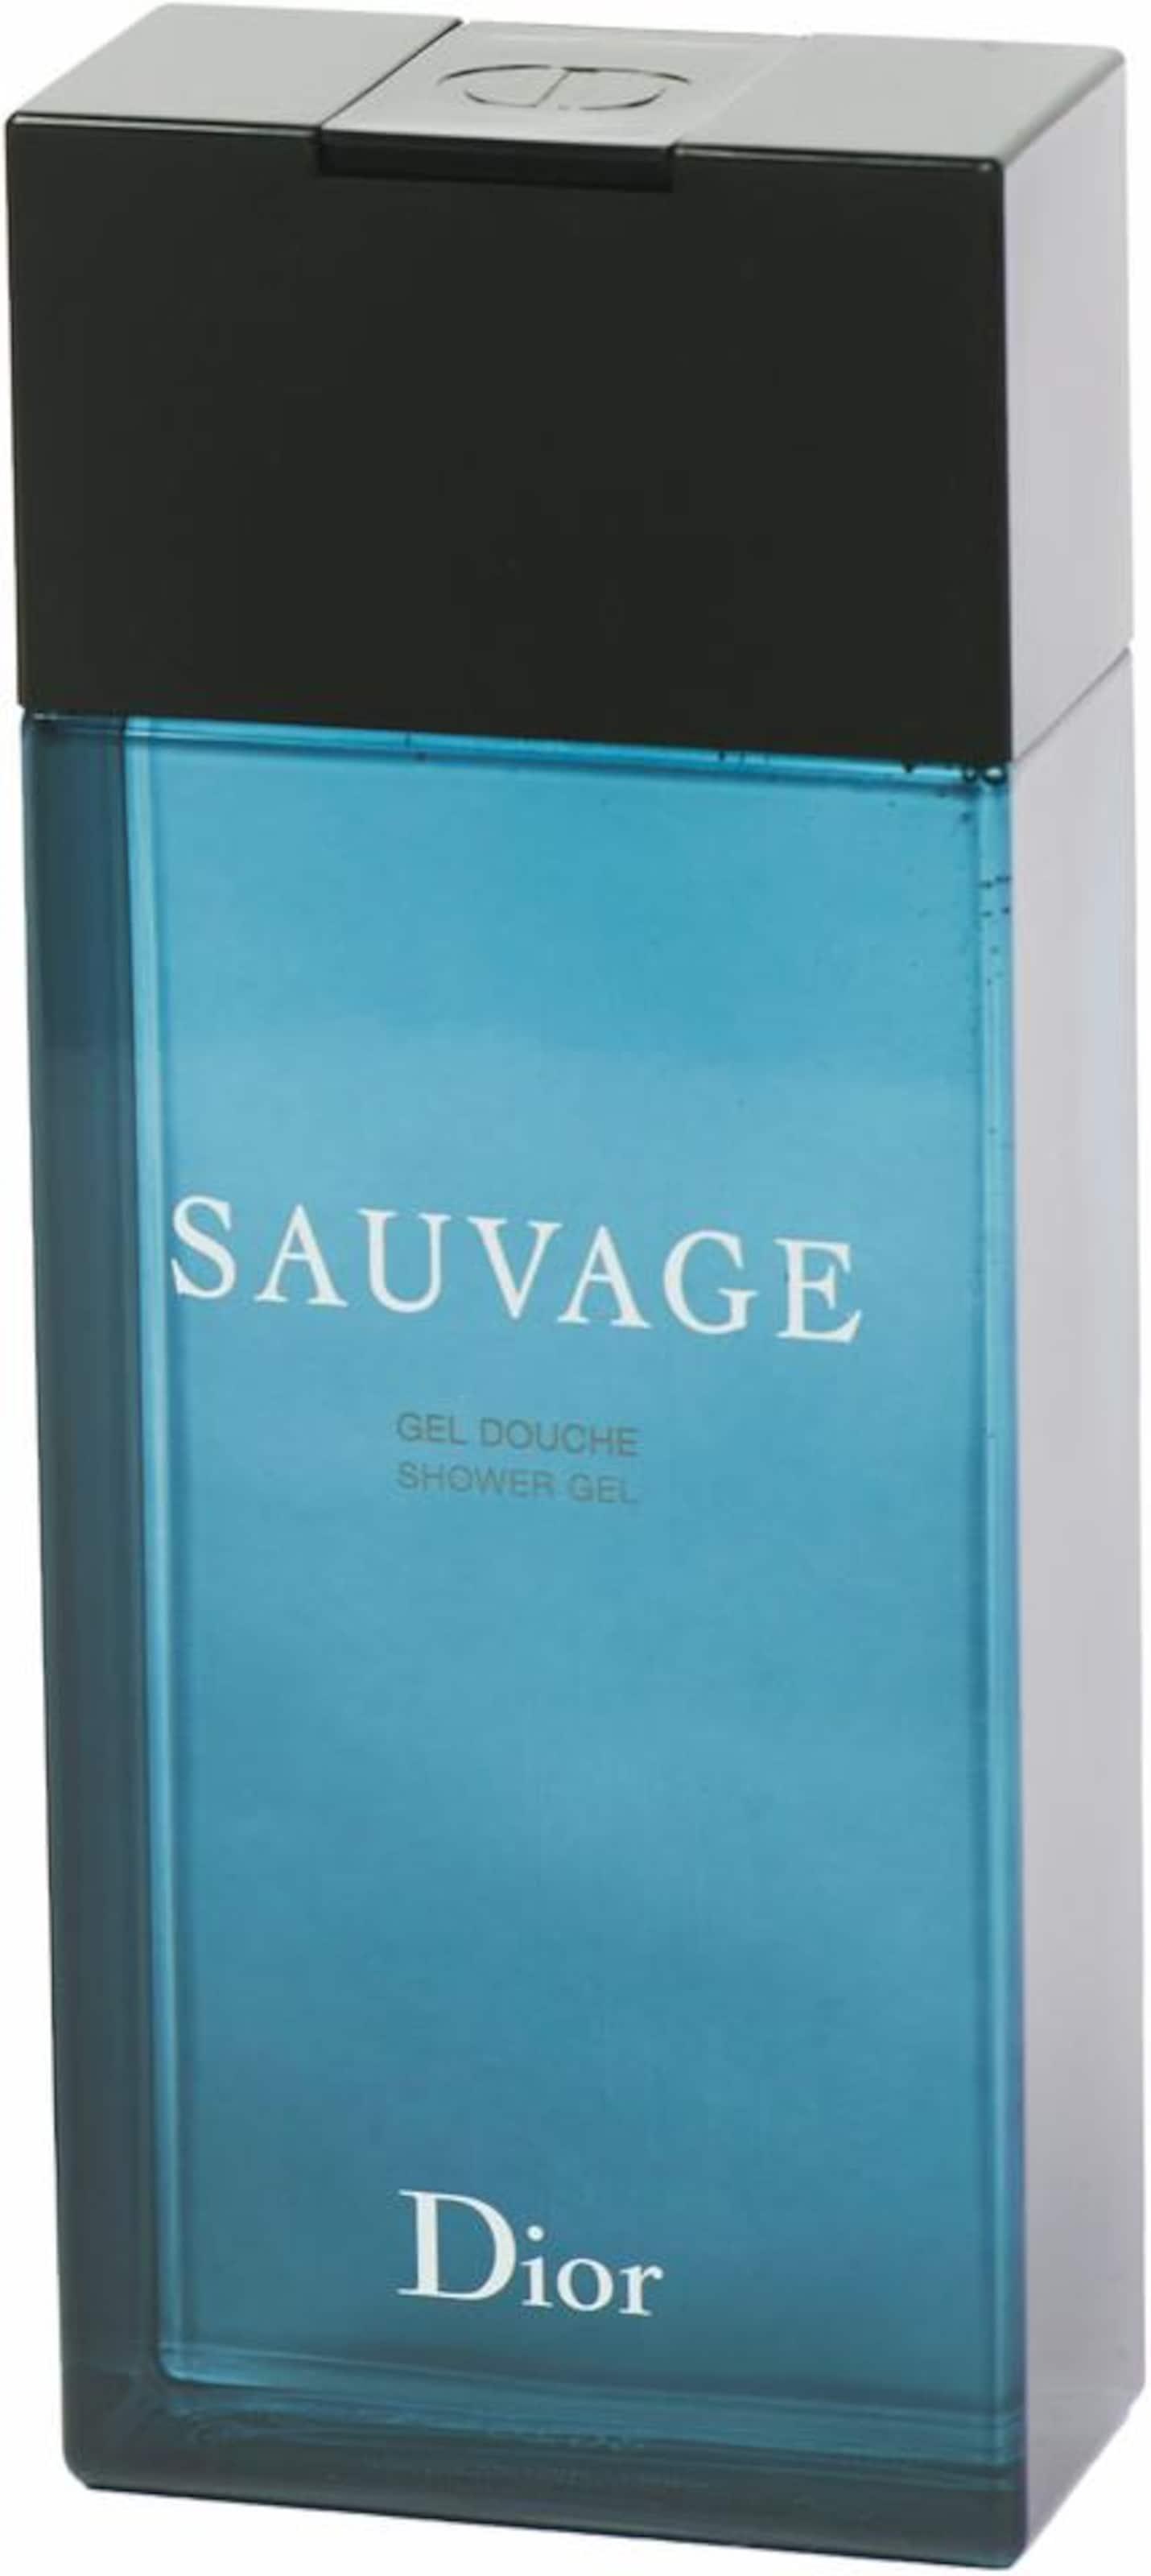 Dior Blau Duschgel In 'sauvage' hrCxtQds